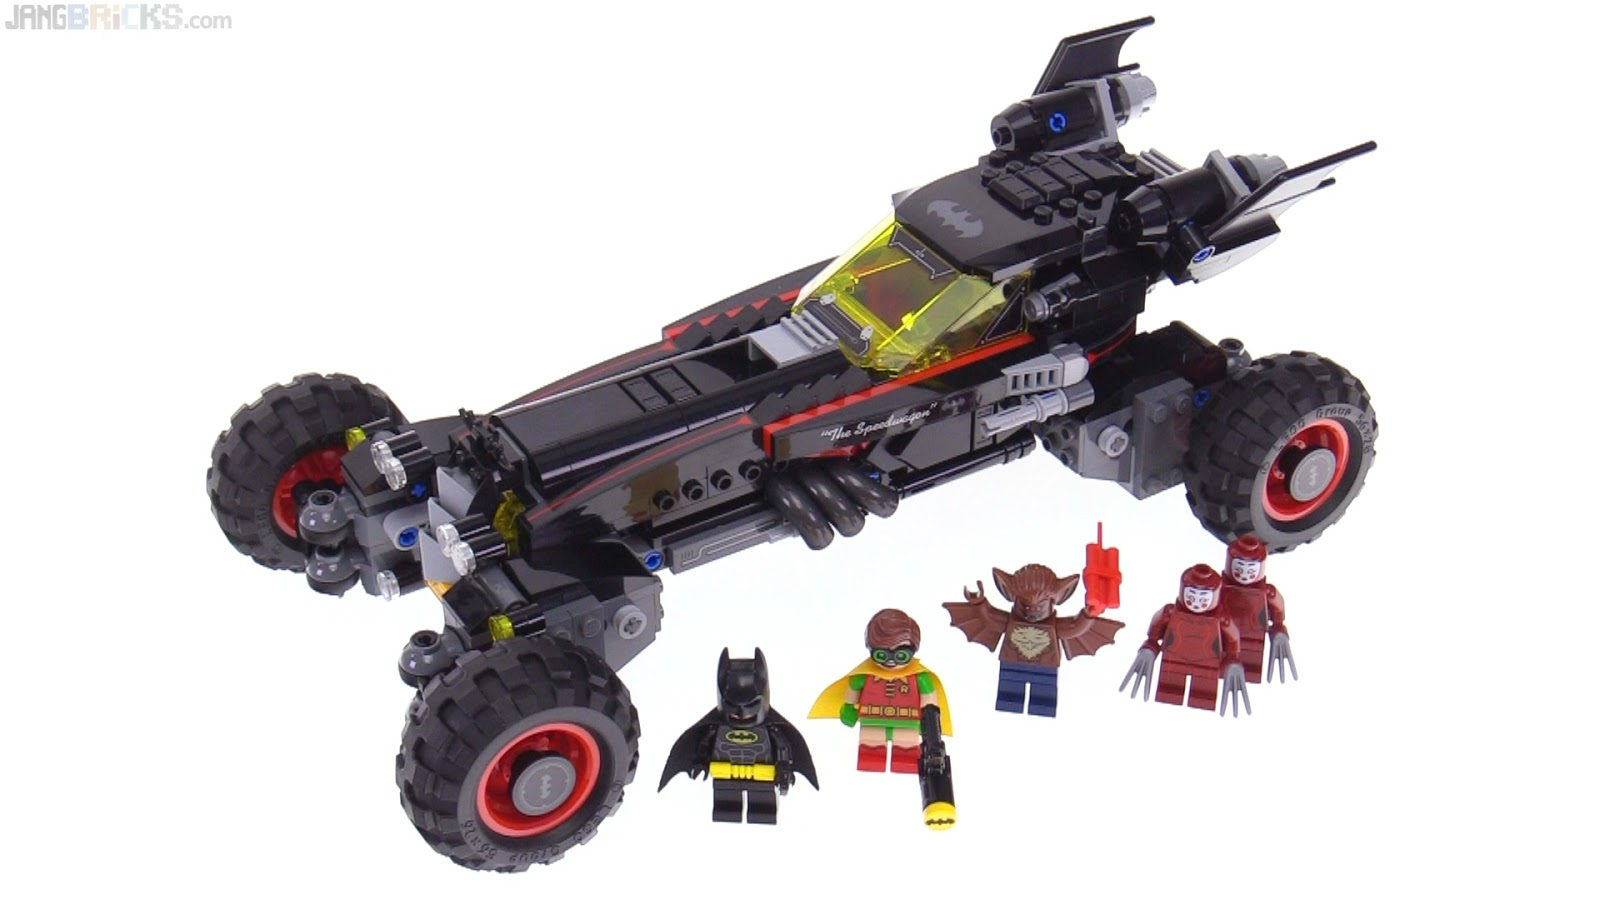 Model LEGO Batman Movie Batmobile Review 70905